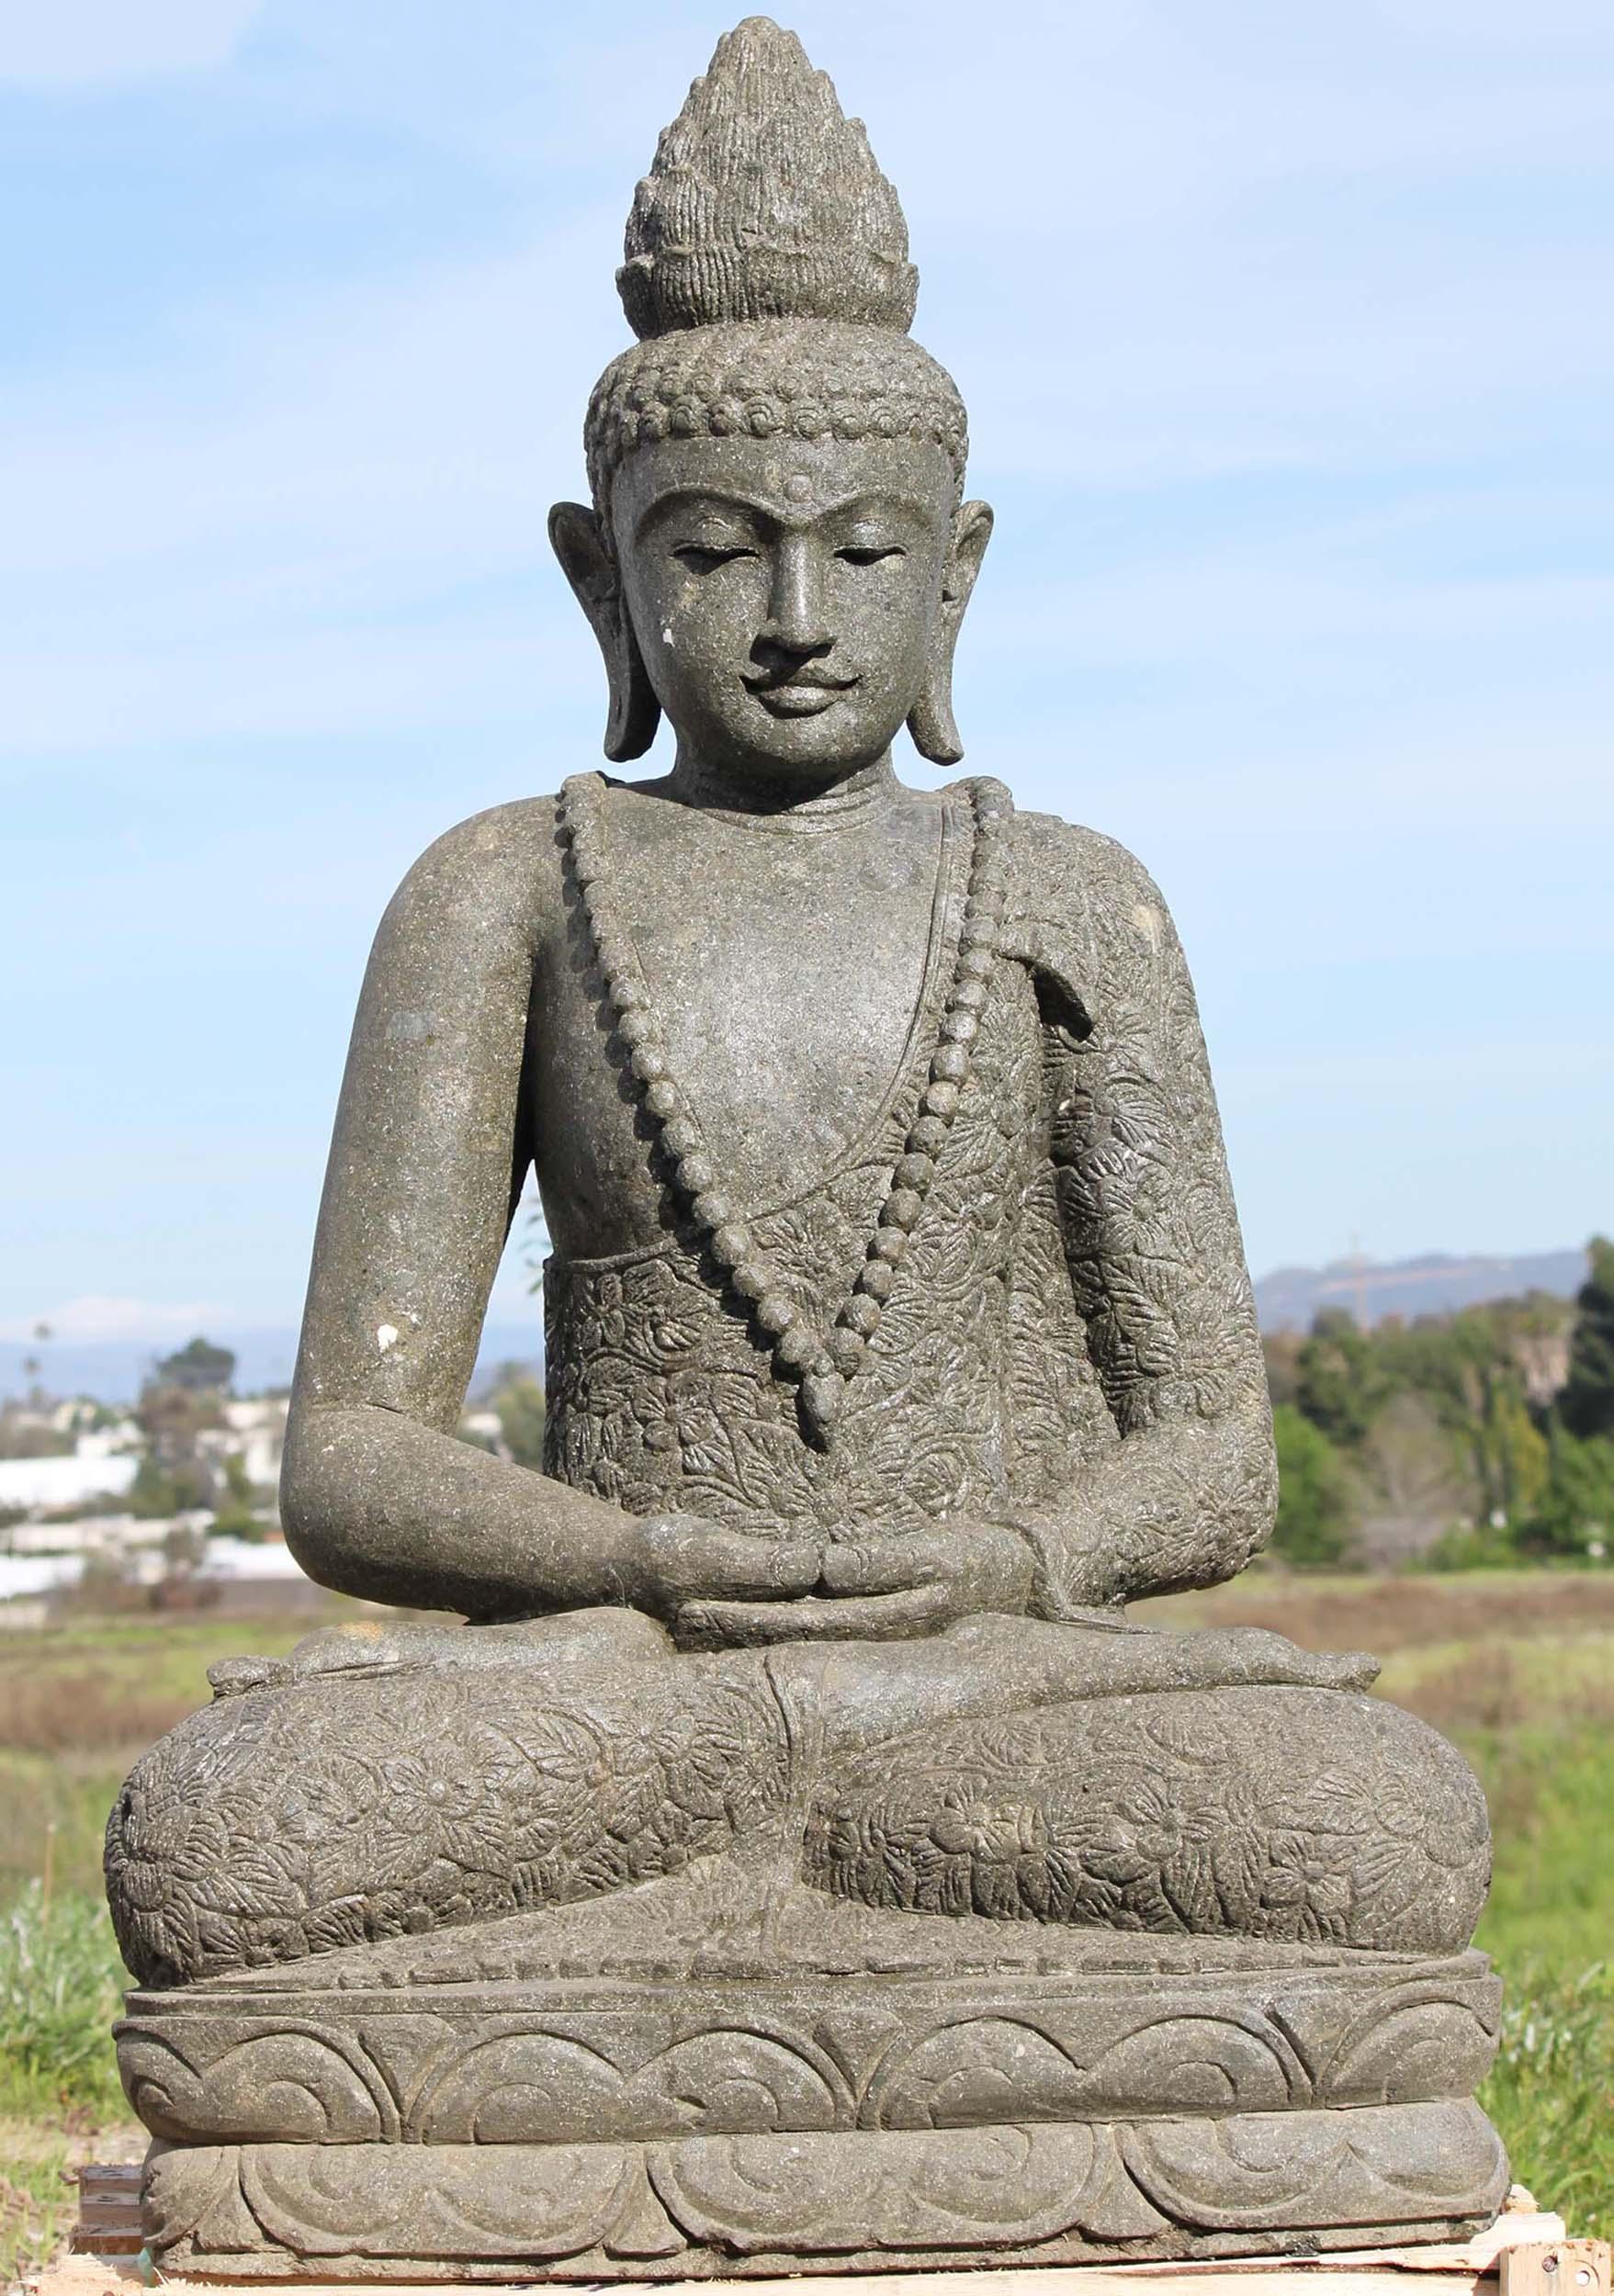 Sold stone meditating buddha garden statue 48 97ls297 for Outdoor buddha